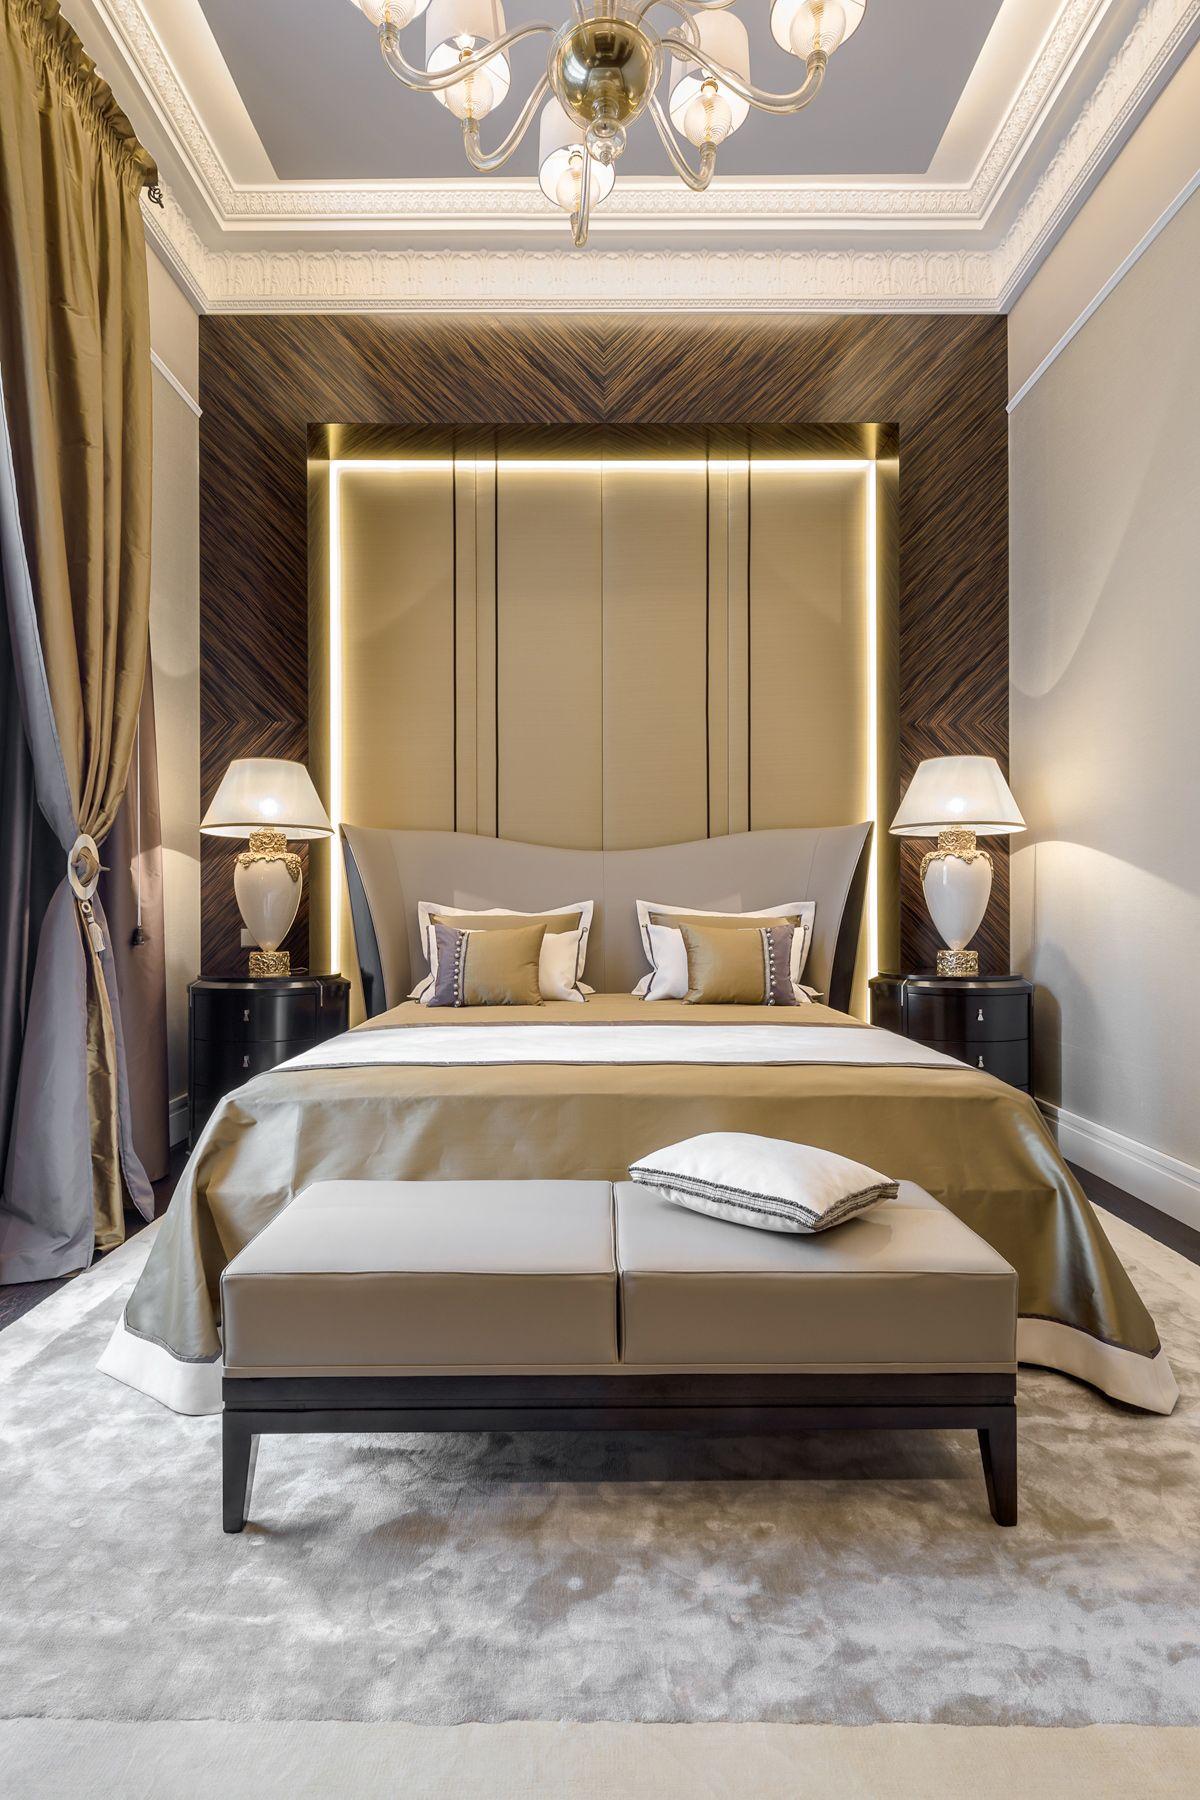 Einzel-schlafzimmer-wohndesign Фото спальня Загородный дом  modern master bedroom design